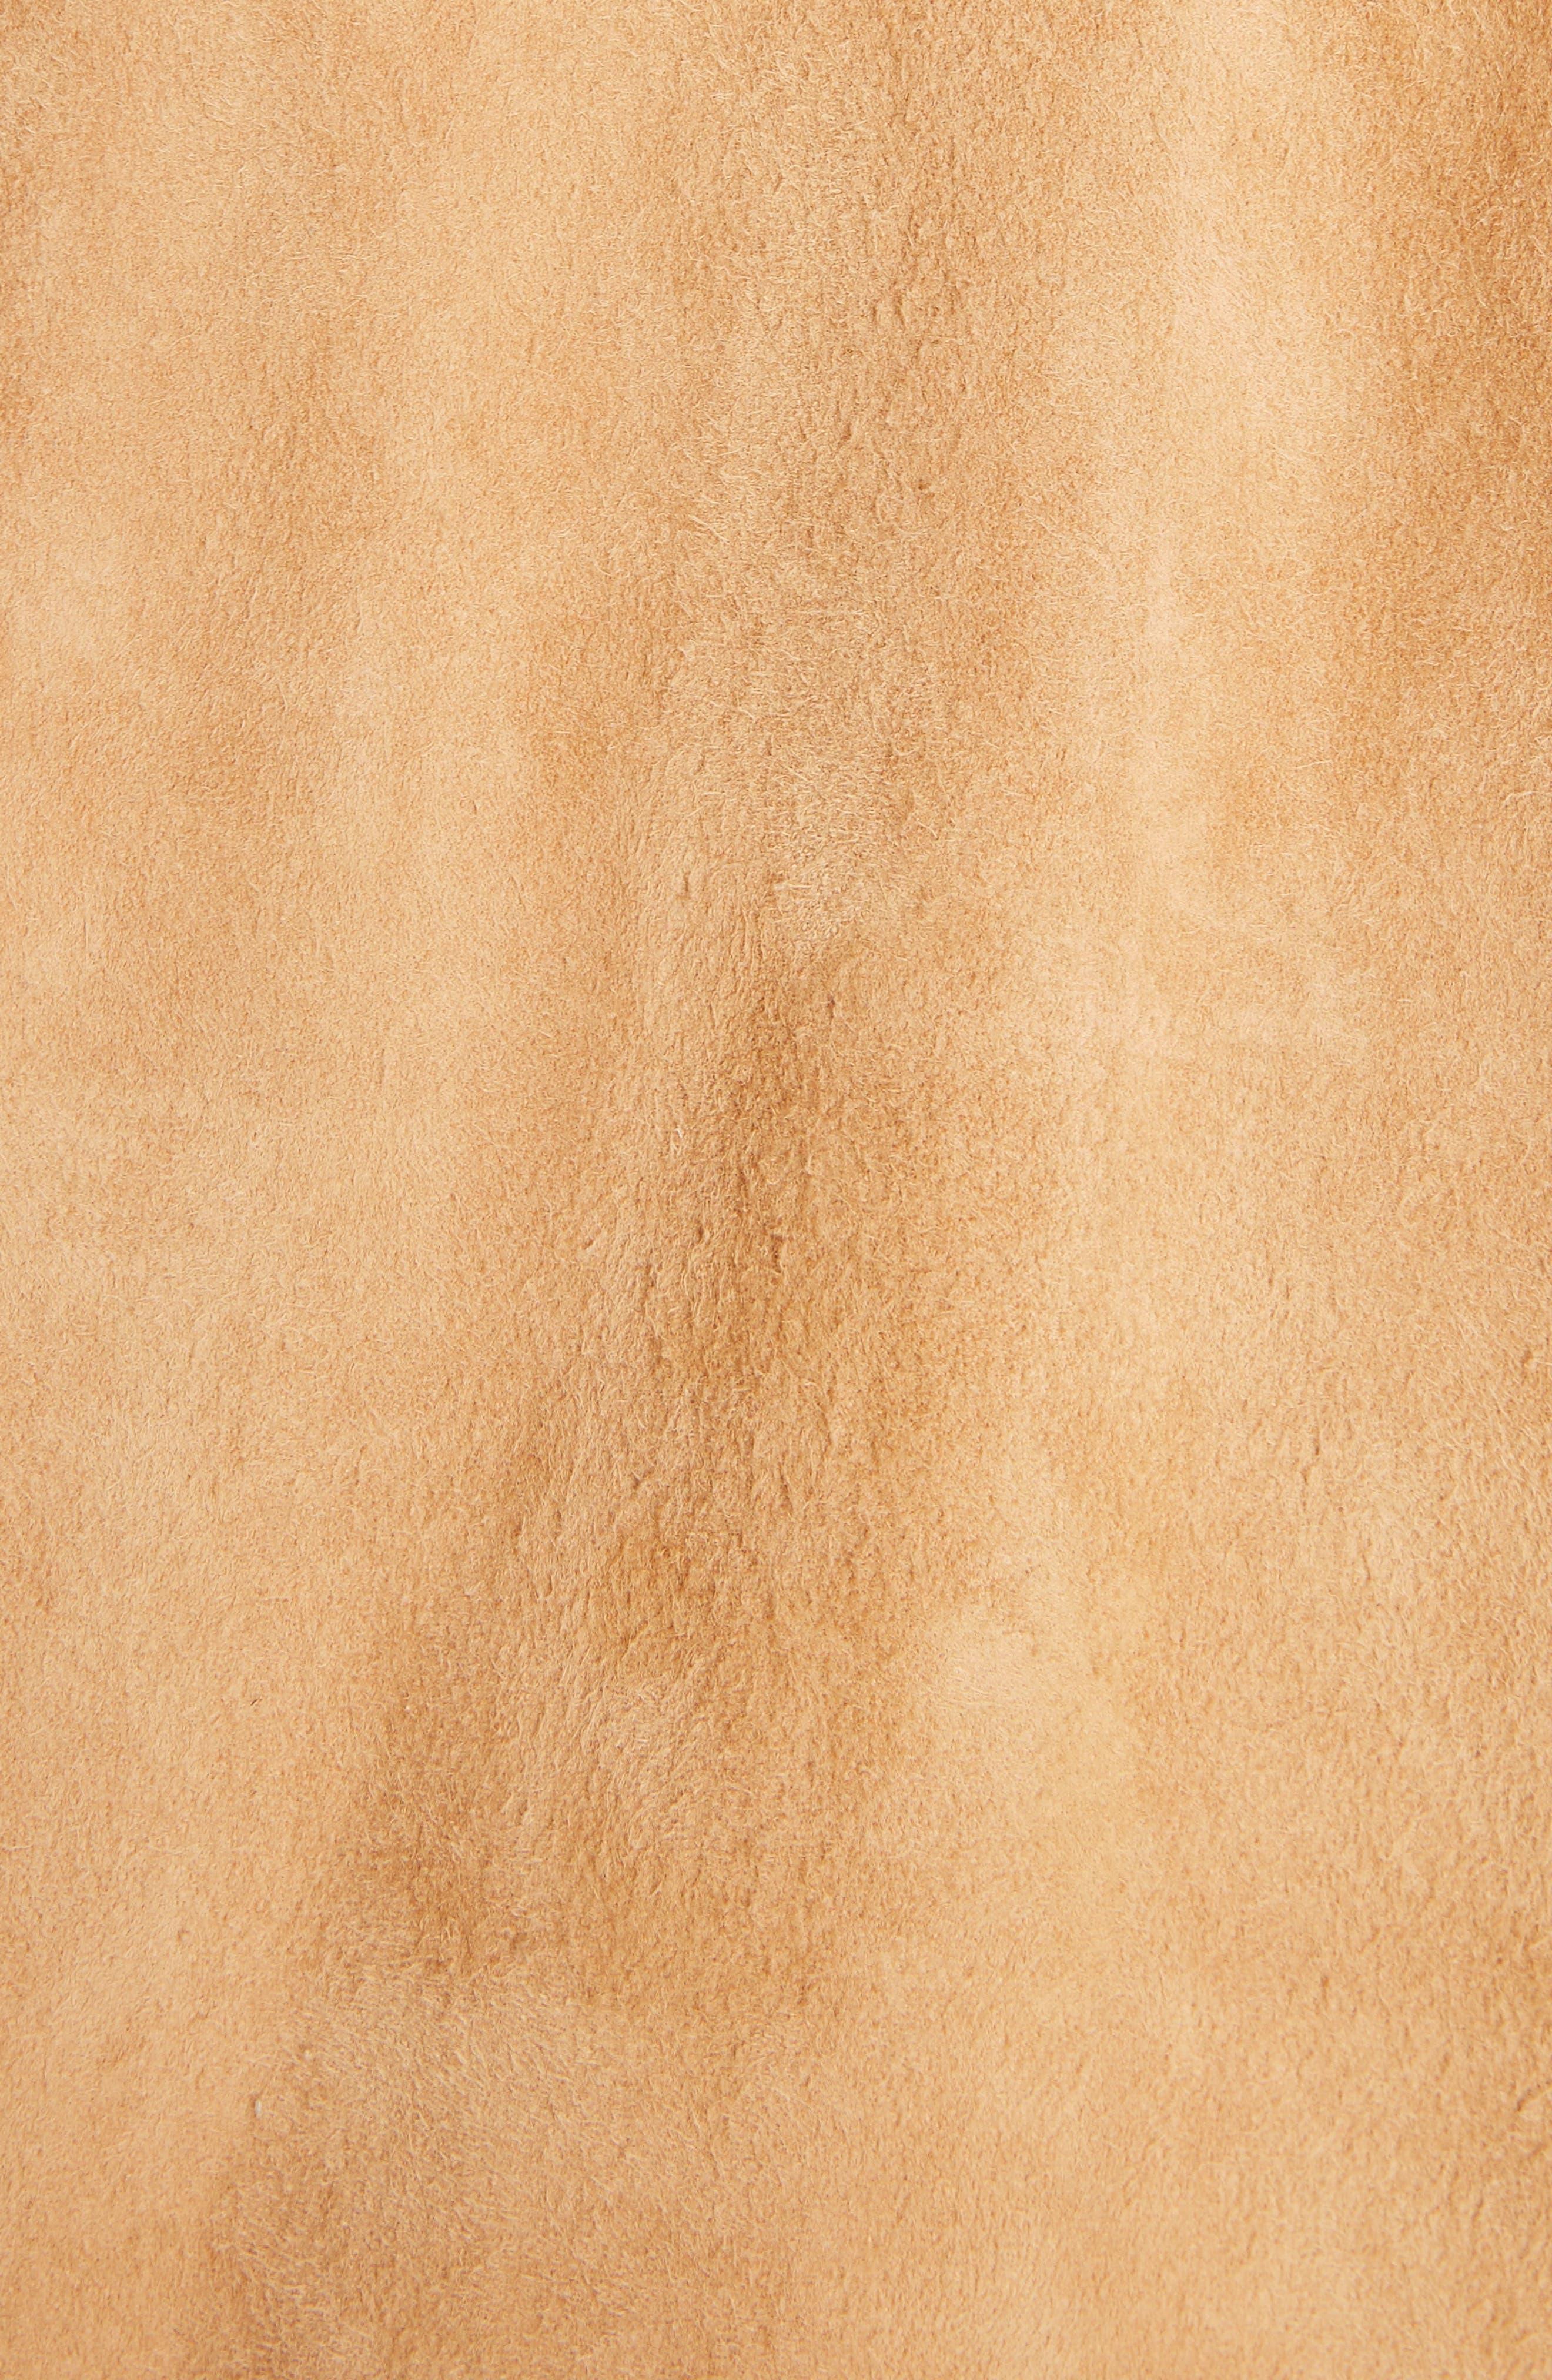 Suokki Suede Moto Jacket,                             Alternate thumbnail 6, color,                             Camel Brown